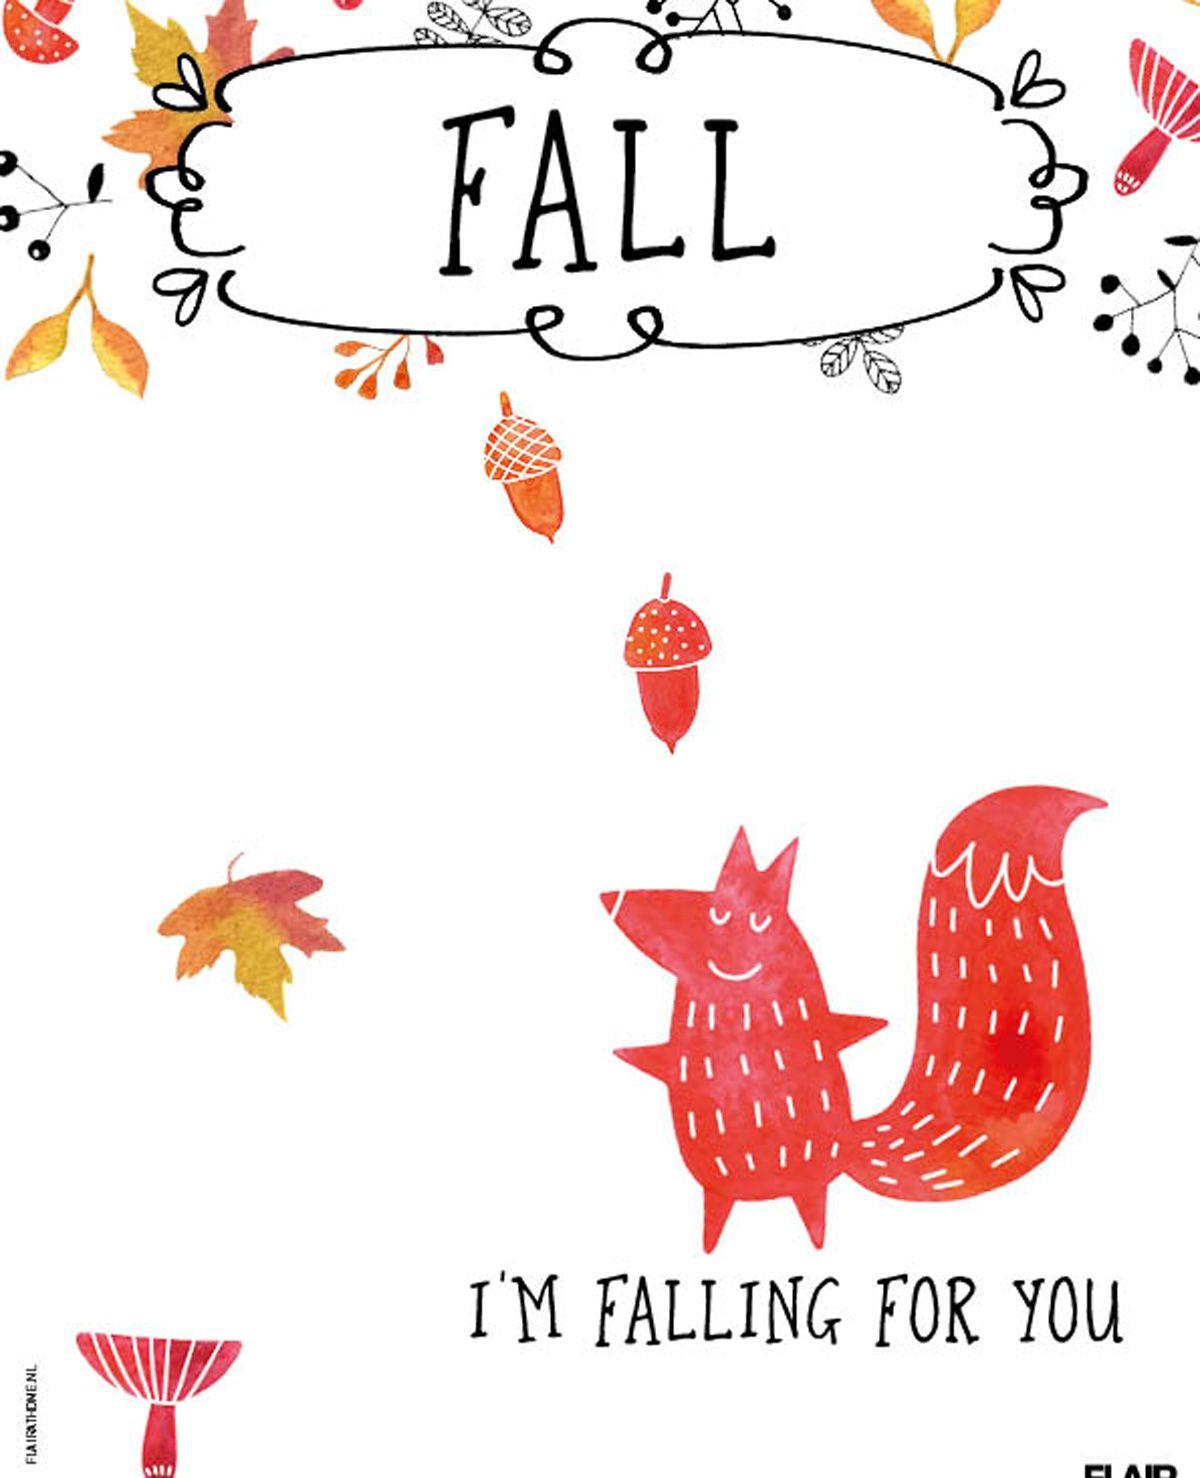 Fall, i'm falling for you   Flair 44 (2015)   #FlairNL #FlairQuote Flairathome.nl